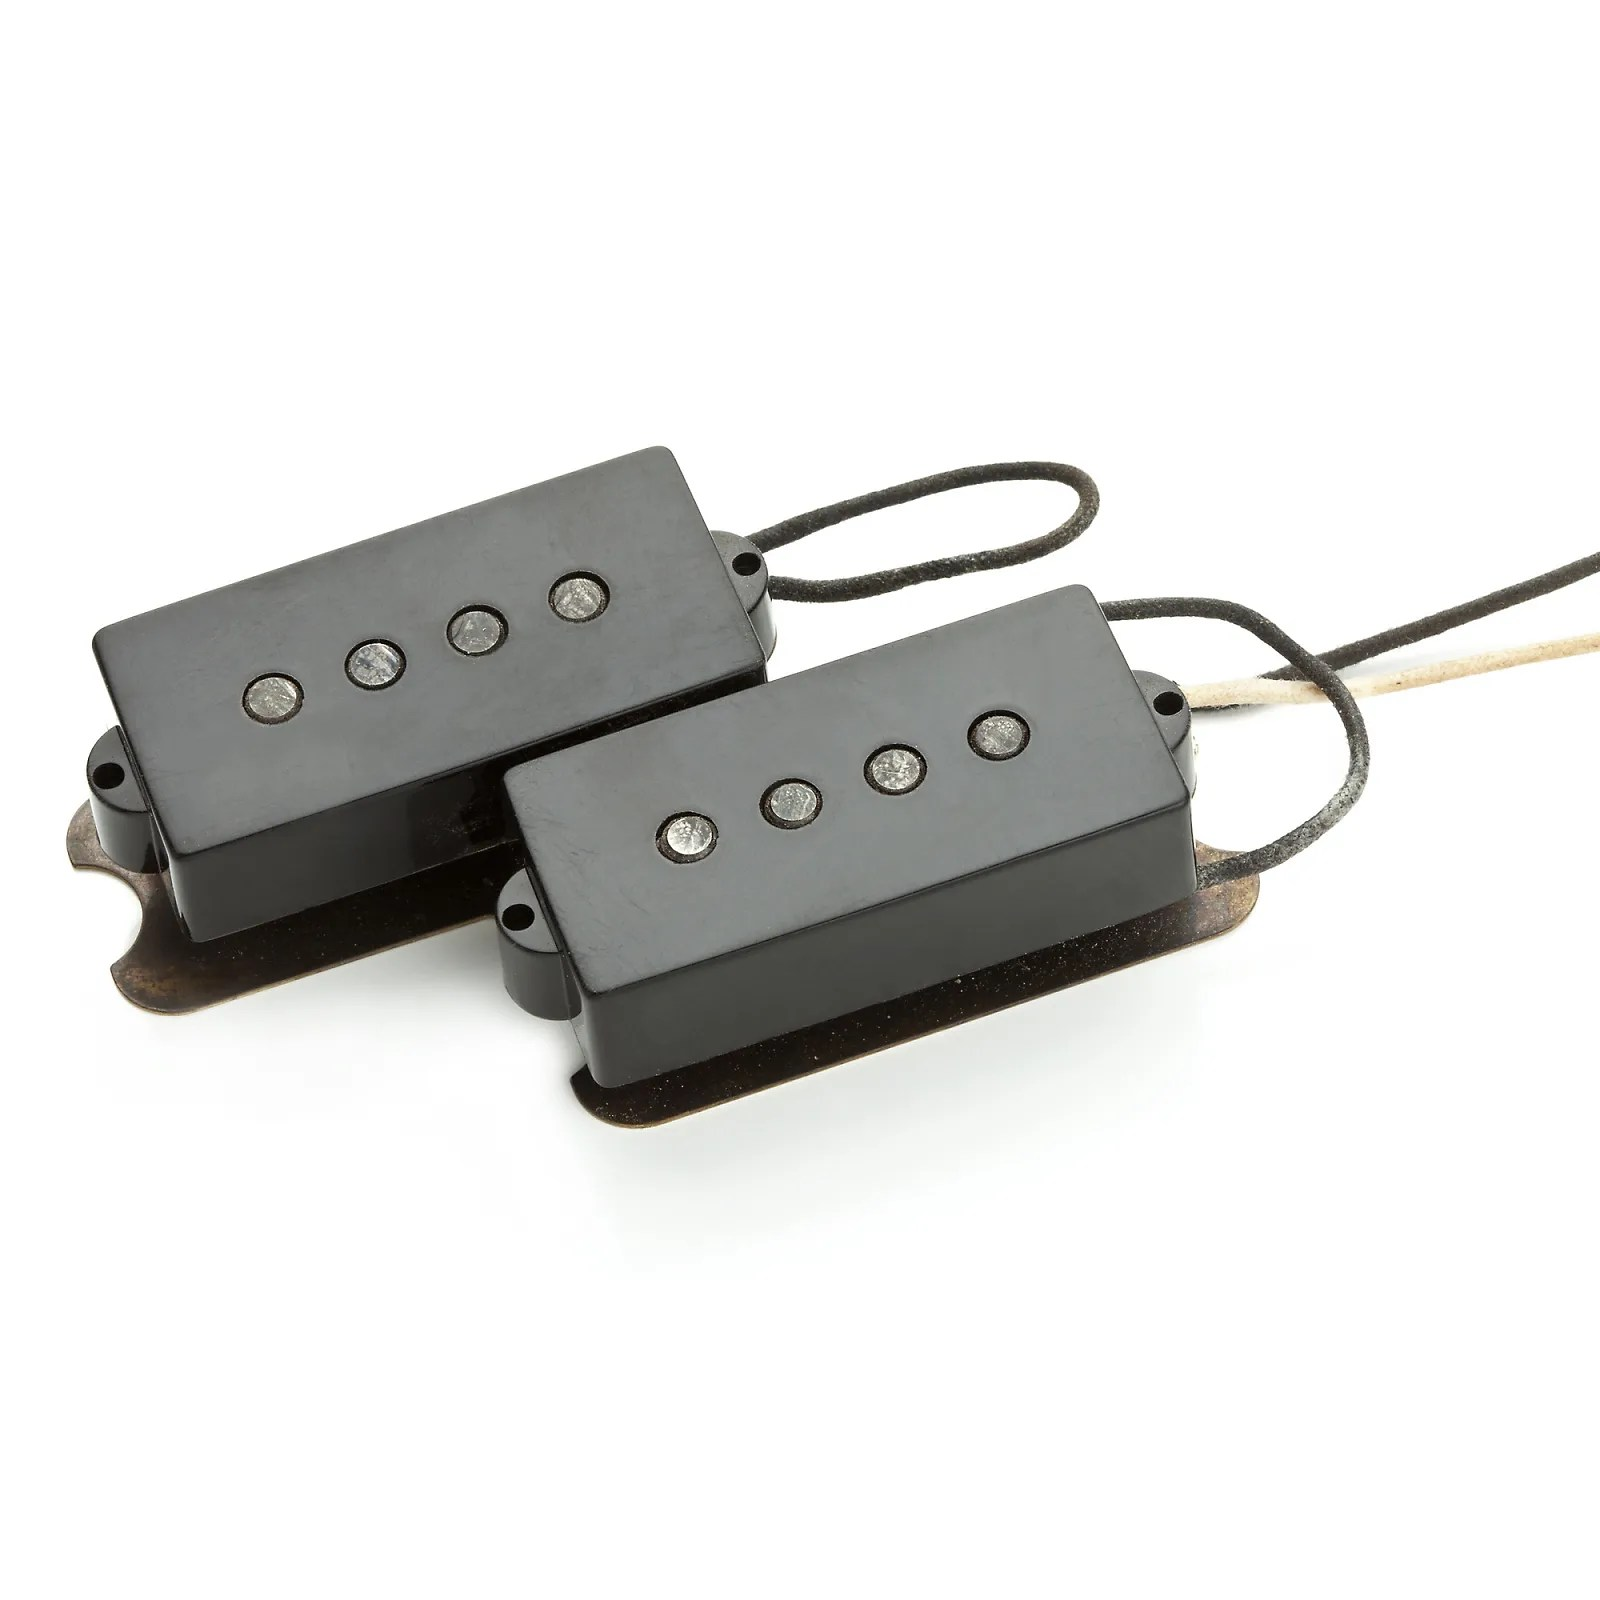 Bass Guitar Wiring Diagram Further Shure Microphone Wiring Diagrams